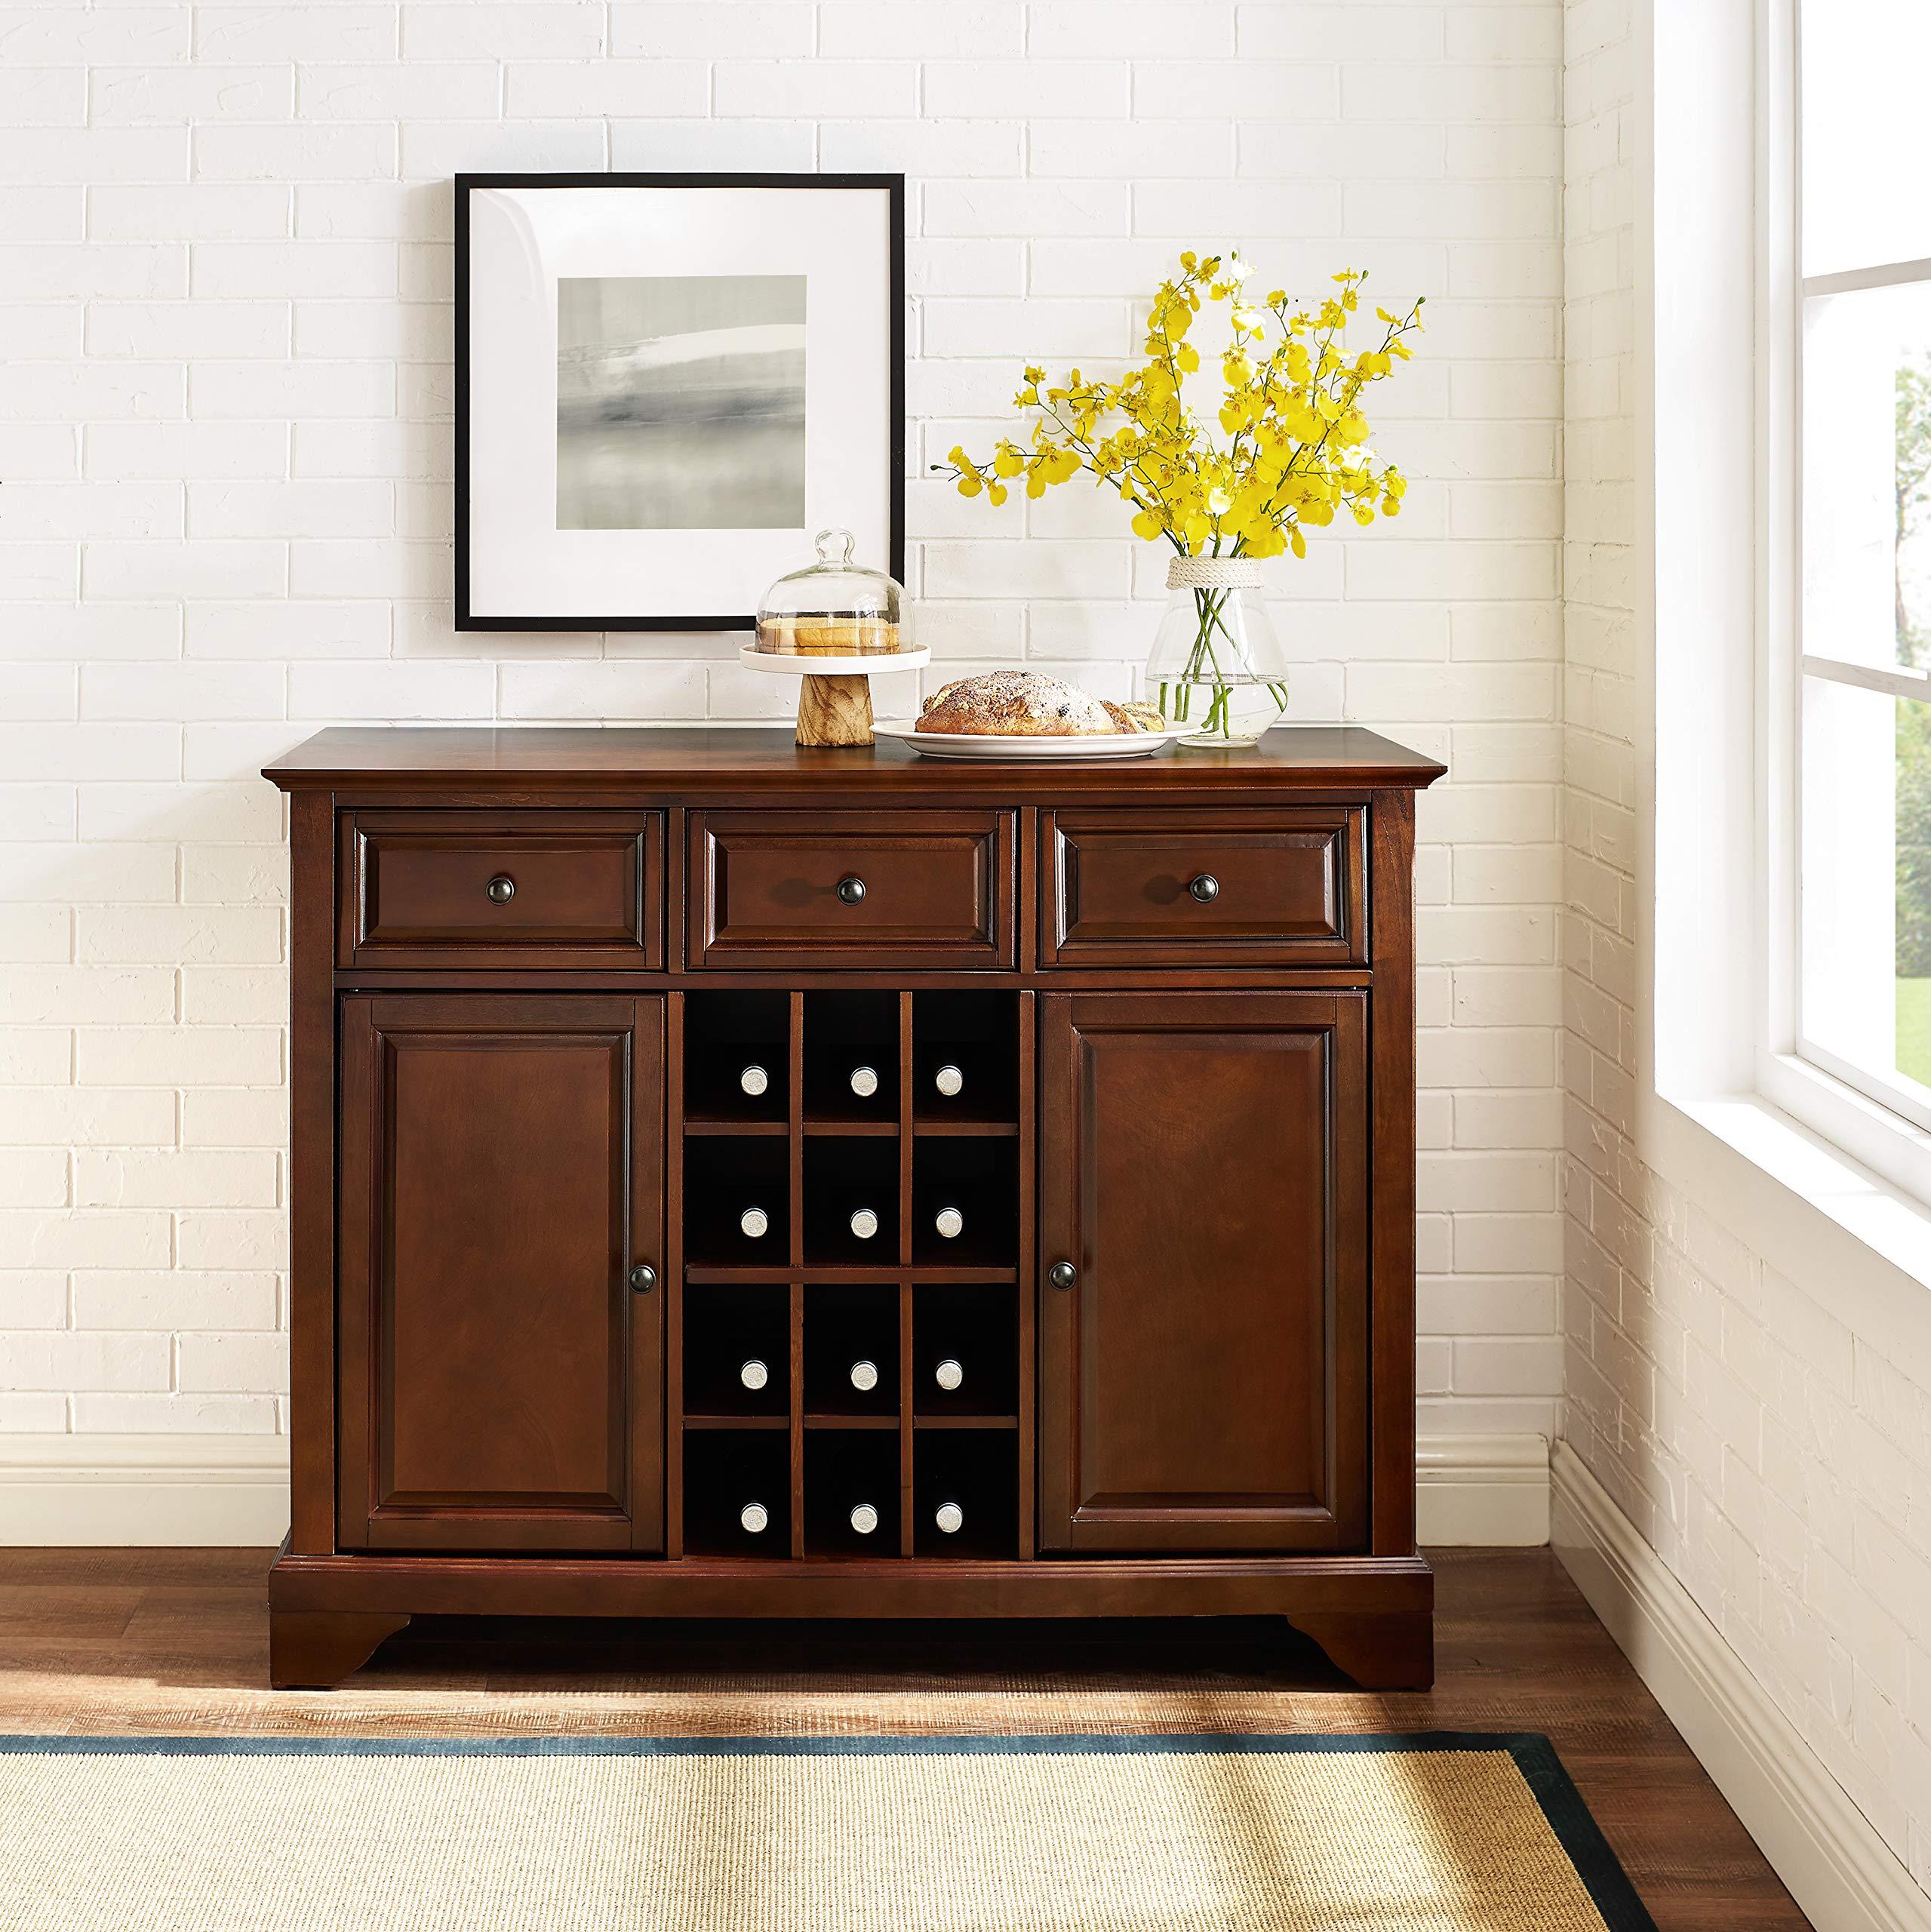 Crosley Furniture LaFayette Wine Buffet / Sideboard - Vintage Mahogany by Crosley Furniture (Image #3)